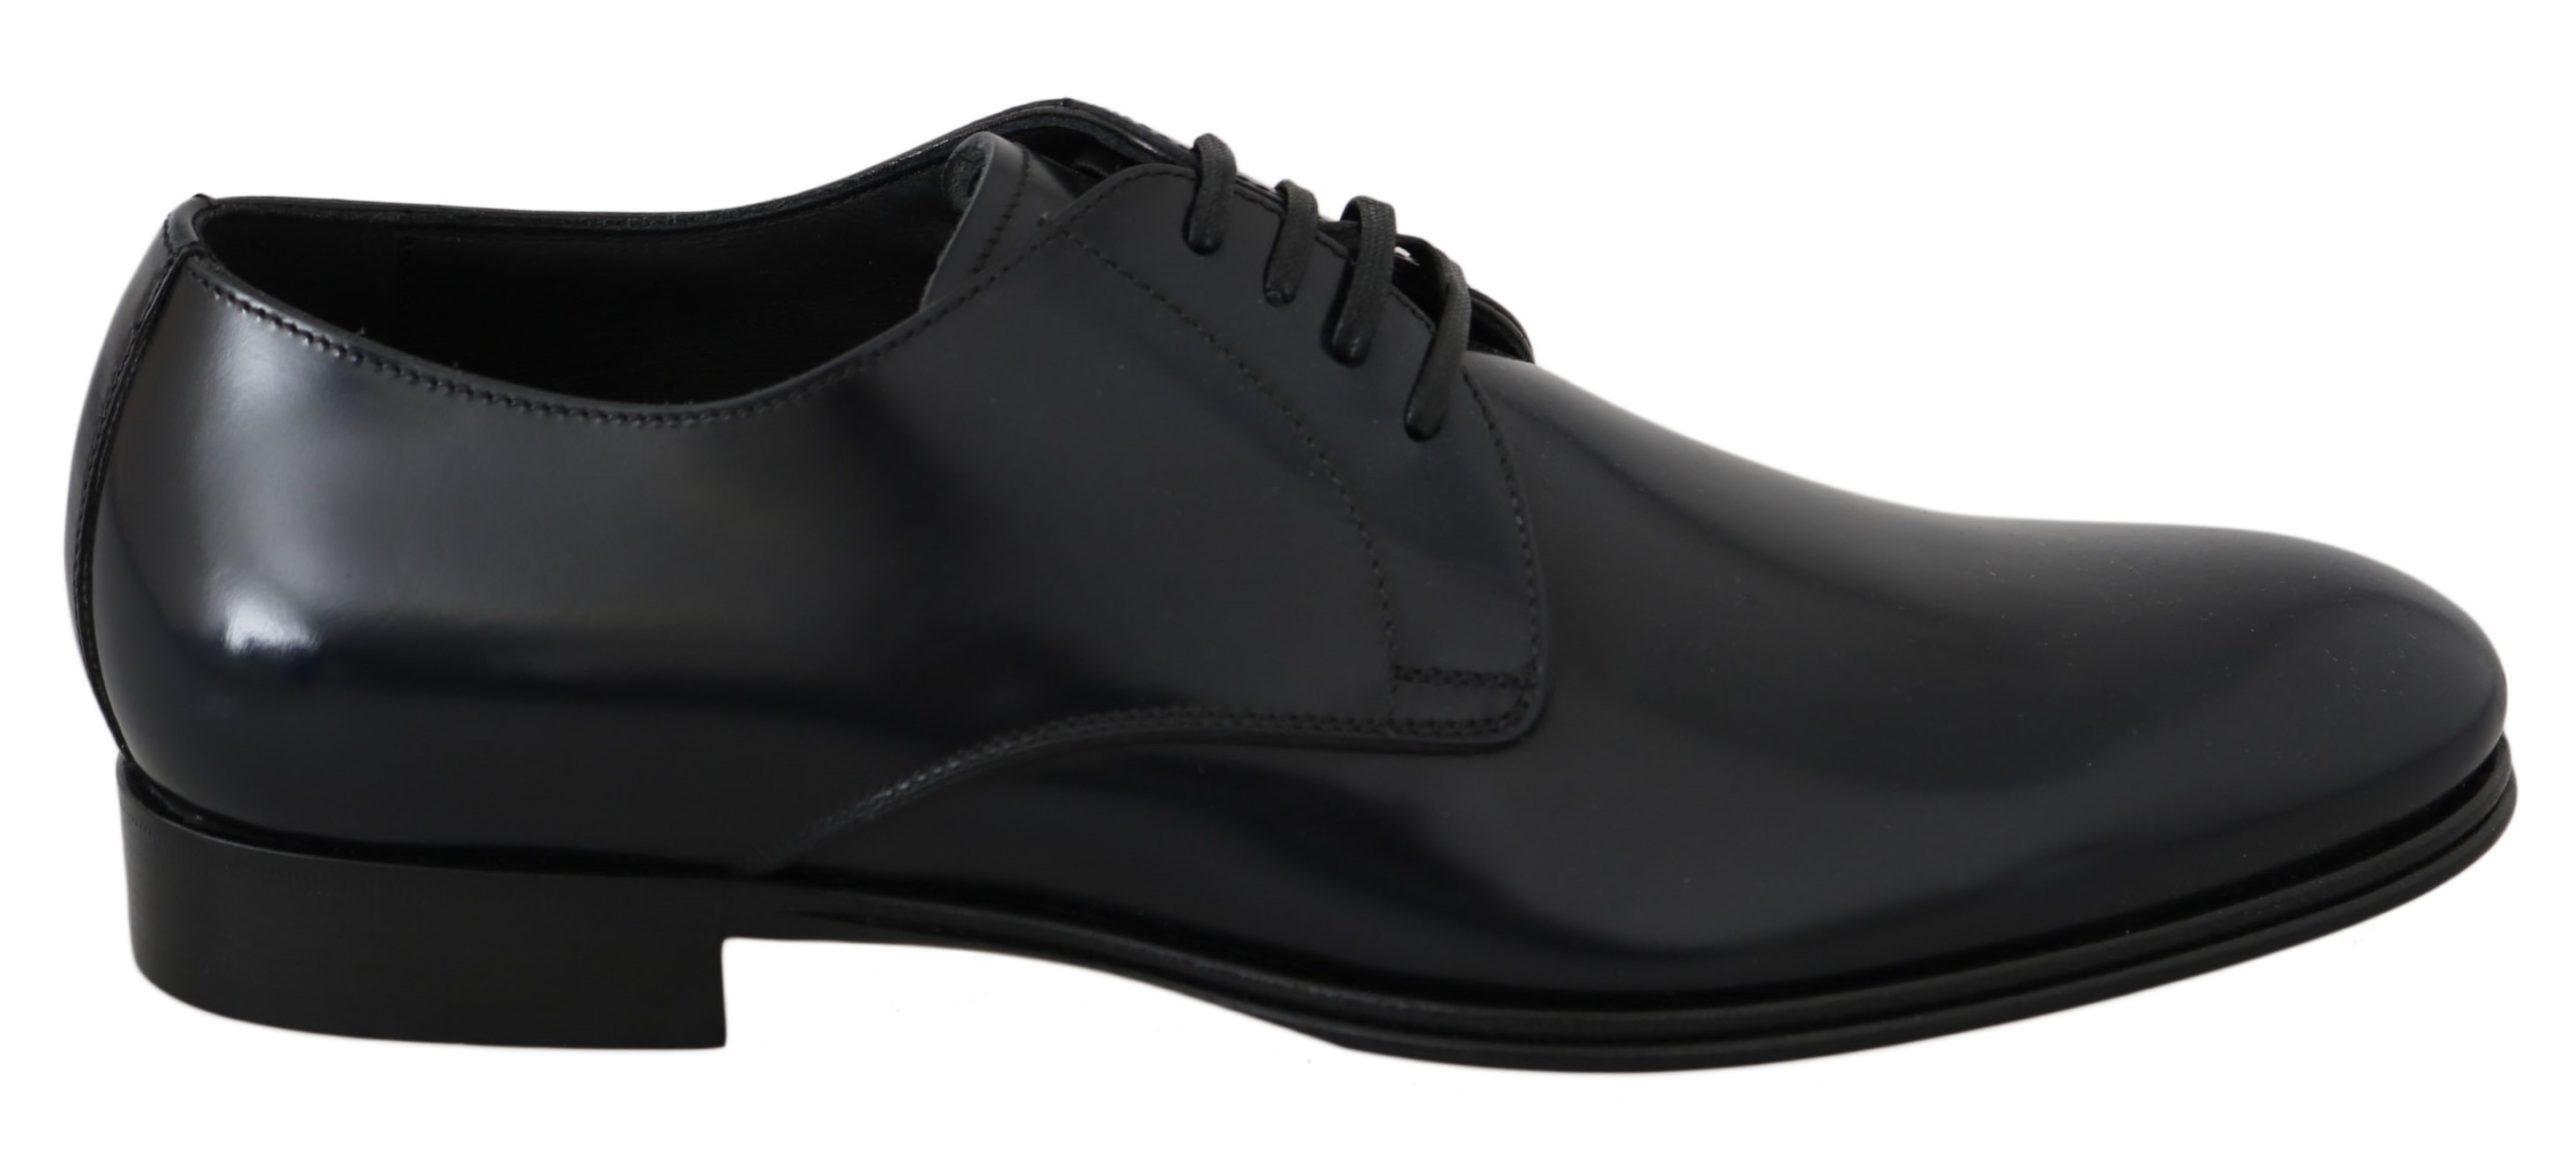 Dolce & Gabbana Men's Shoes Blue MV2415 - EU39/US6